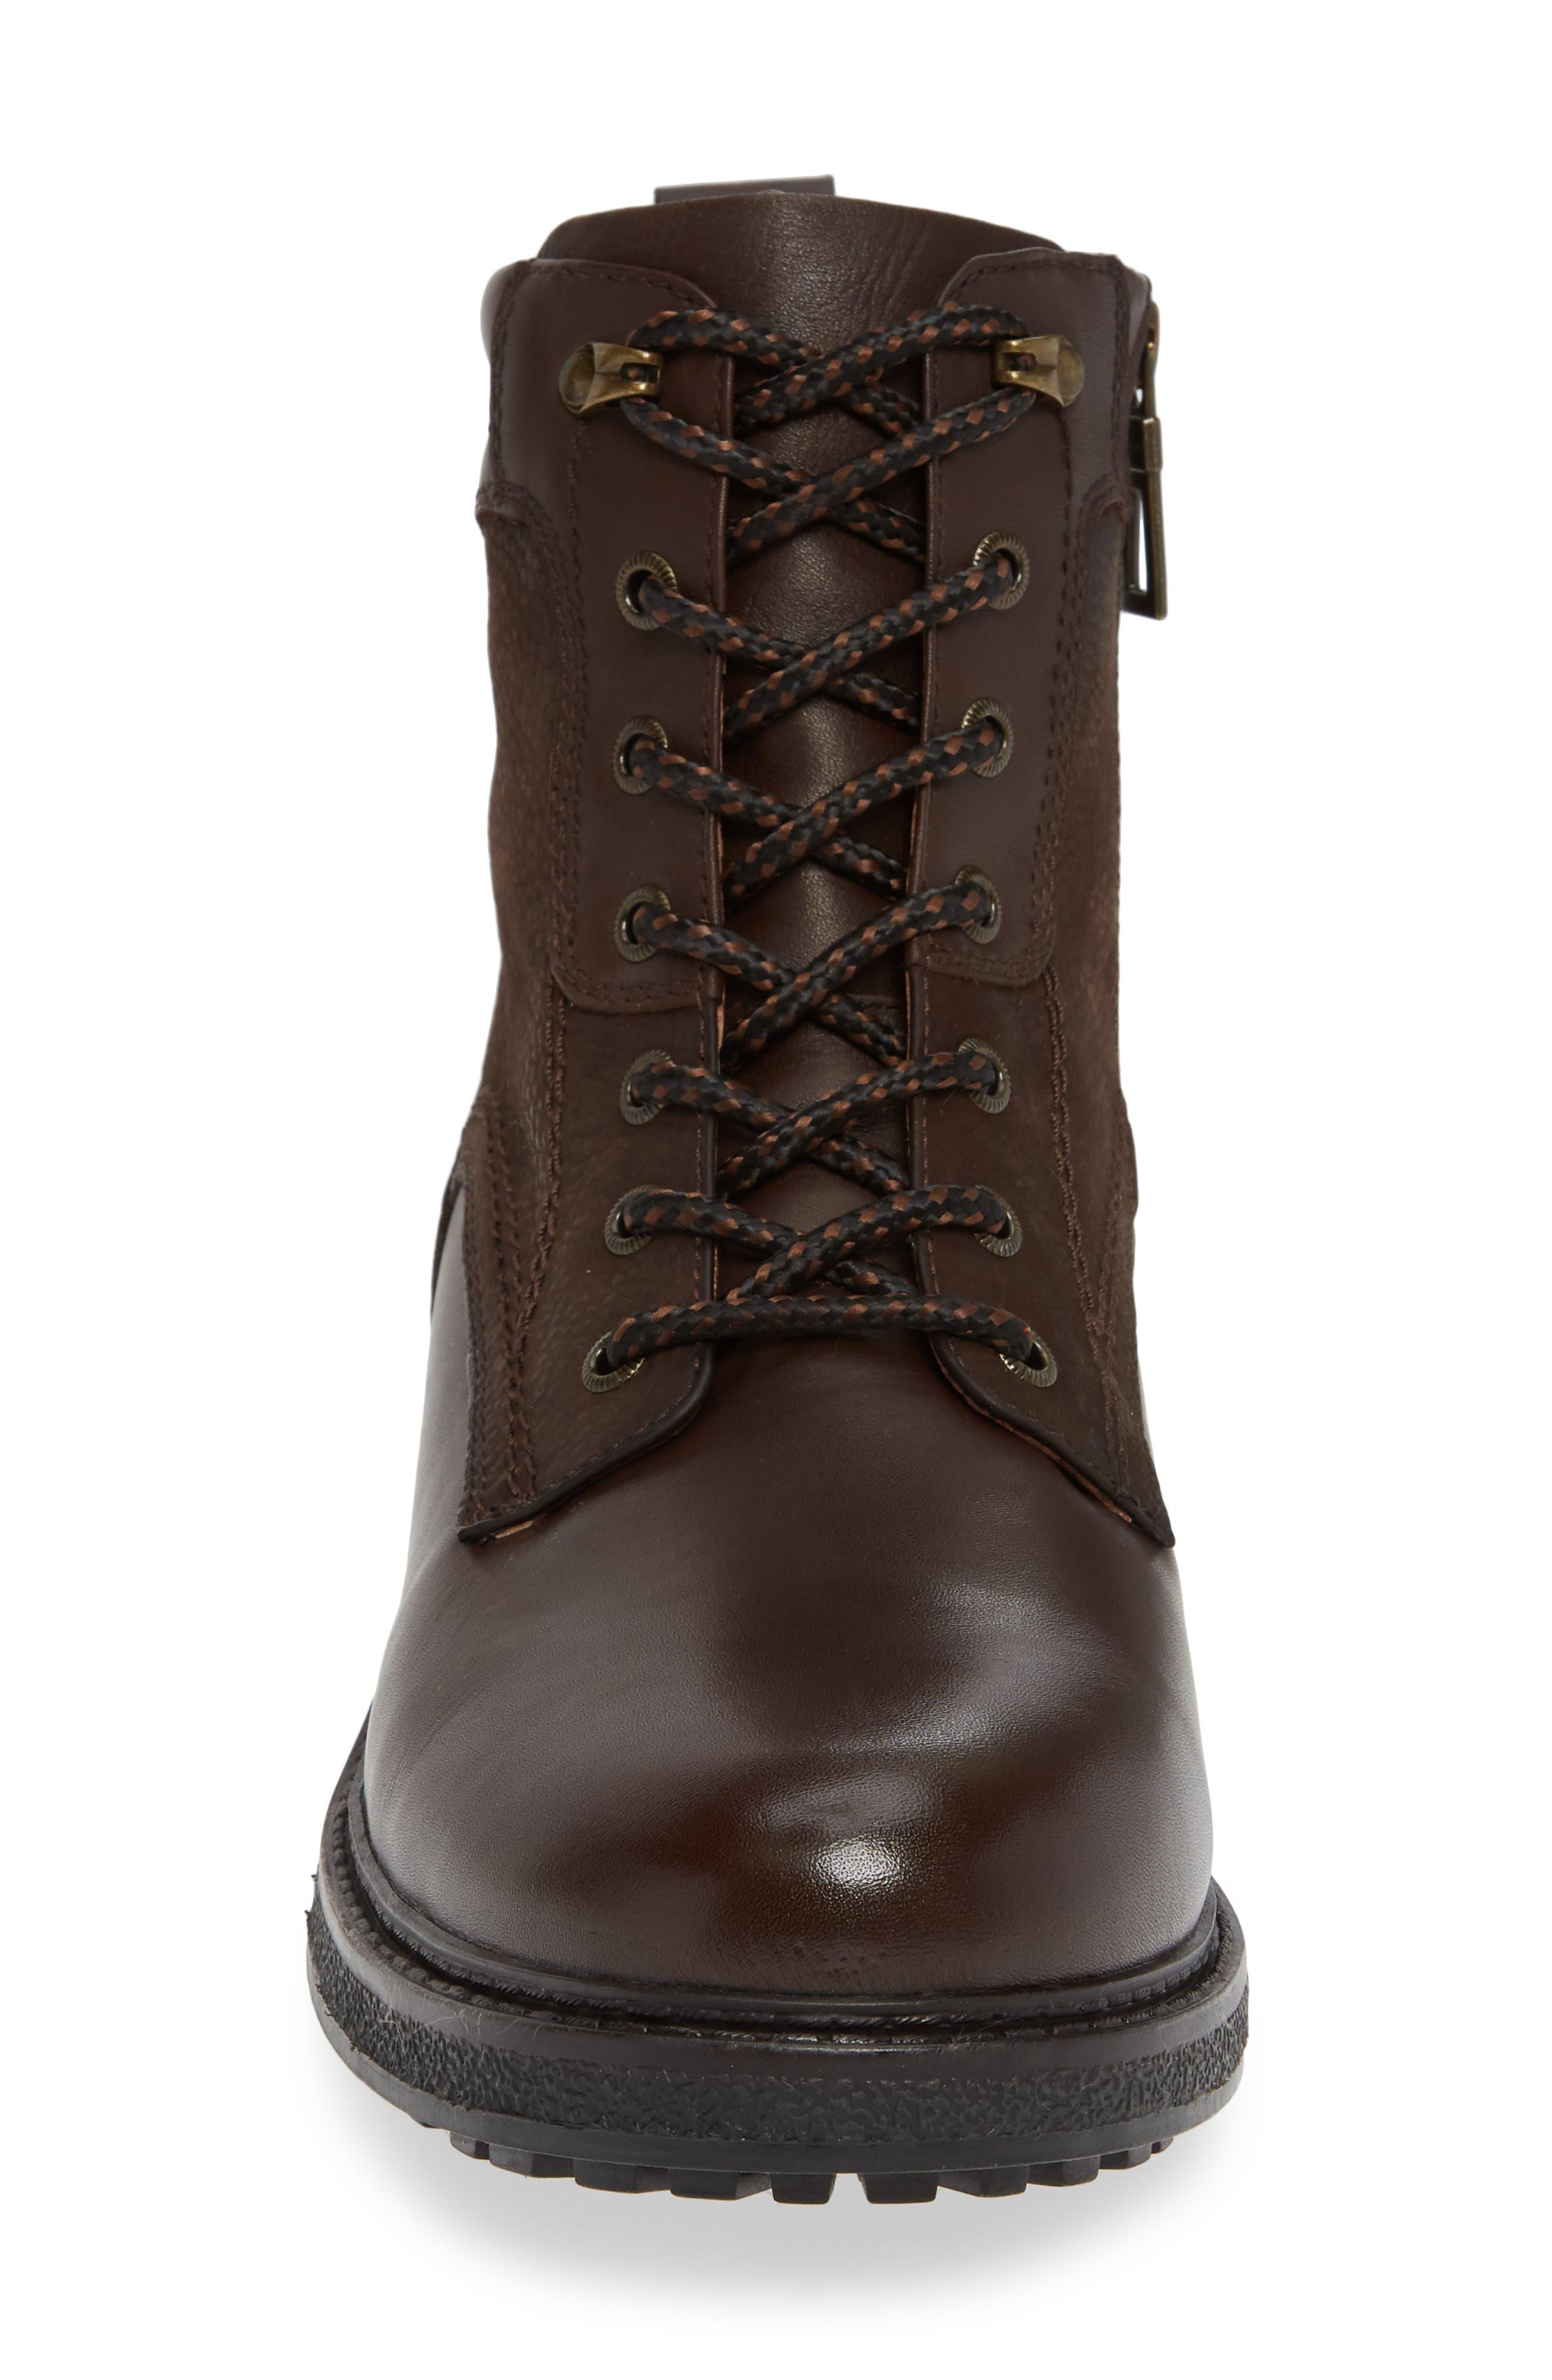 BLONDO, Jasper Waterproof Plain Toe Boot, Alternate thumbnail 4, color, BROWN LEATHER